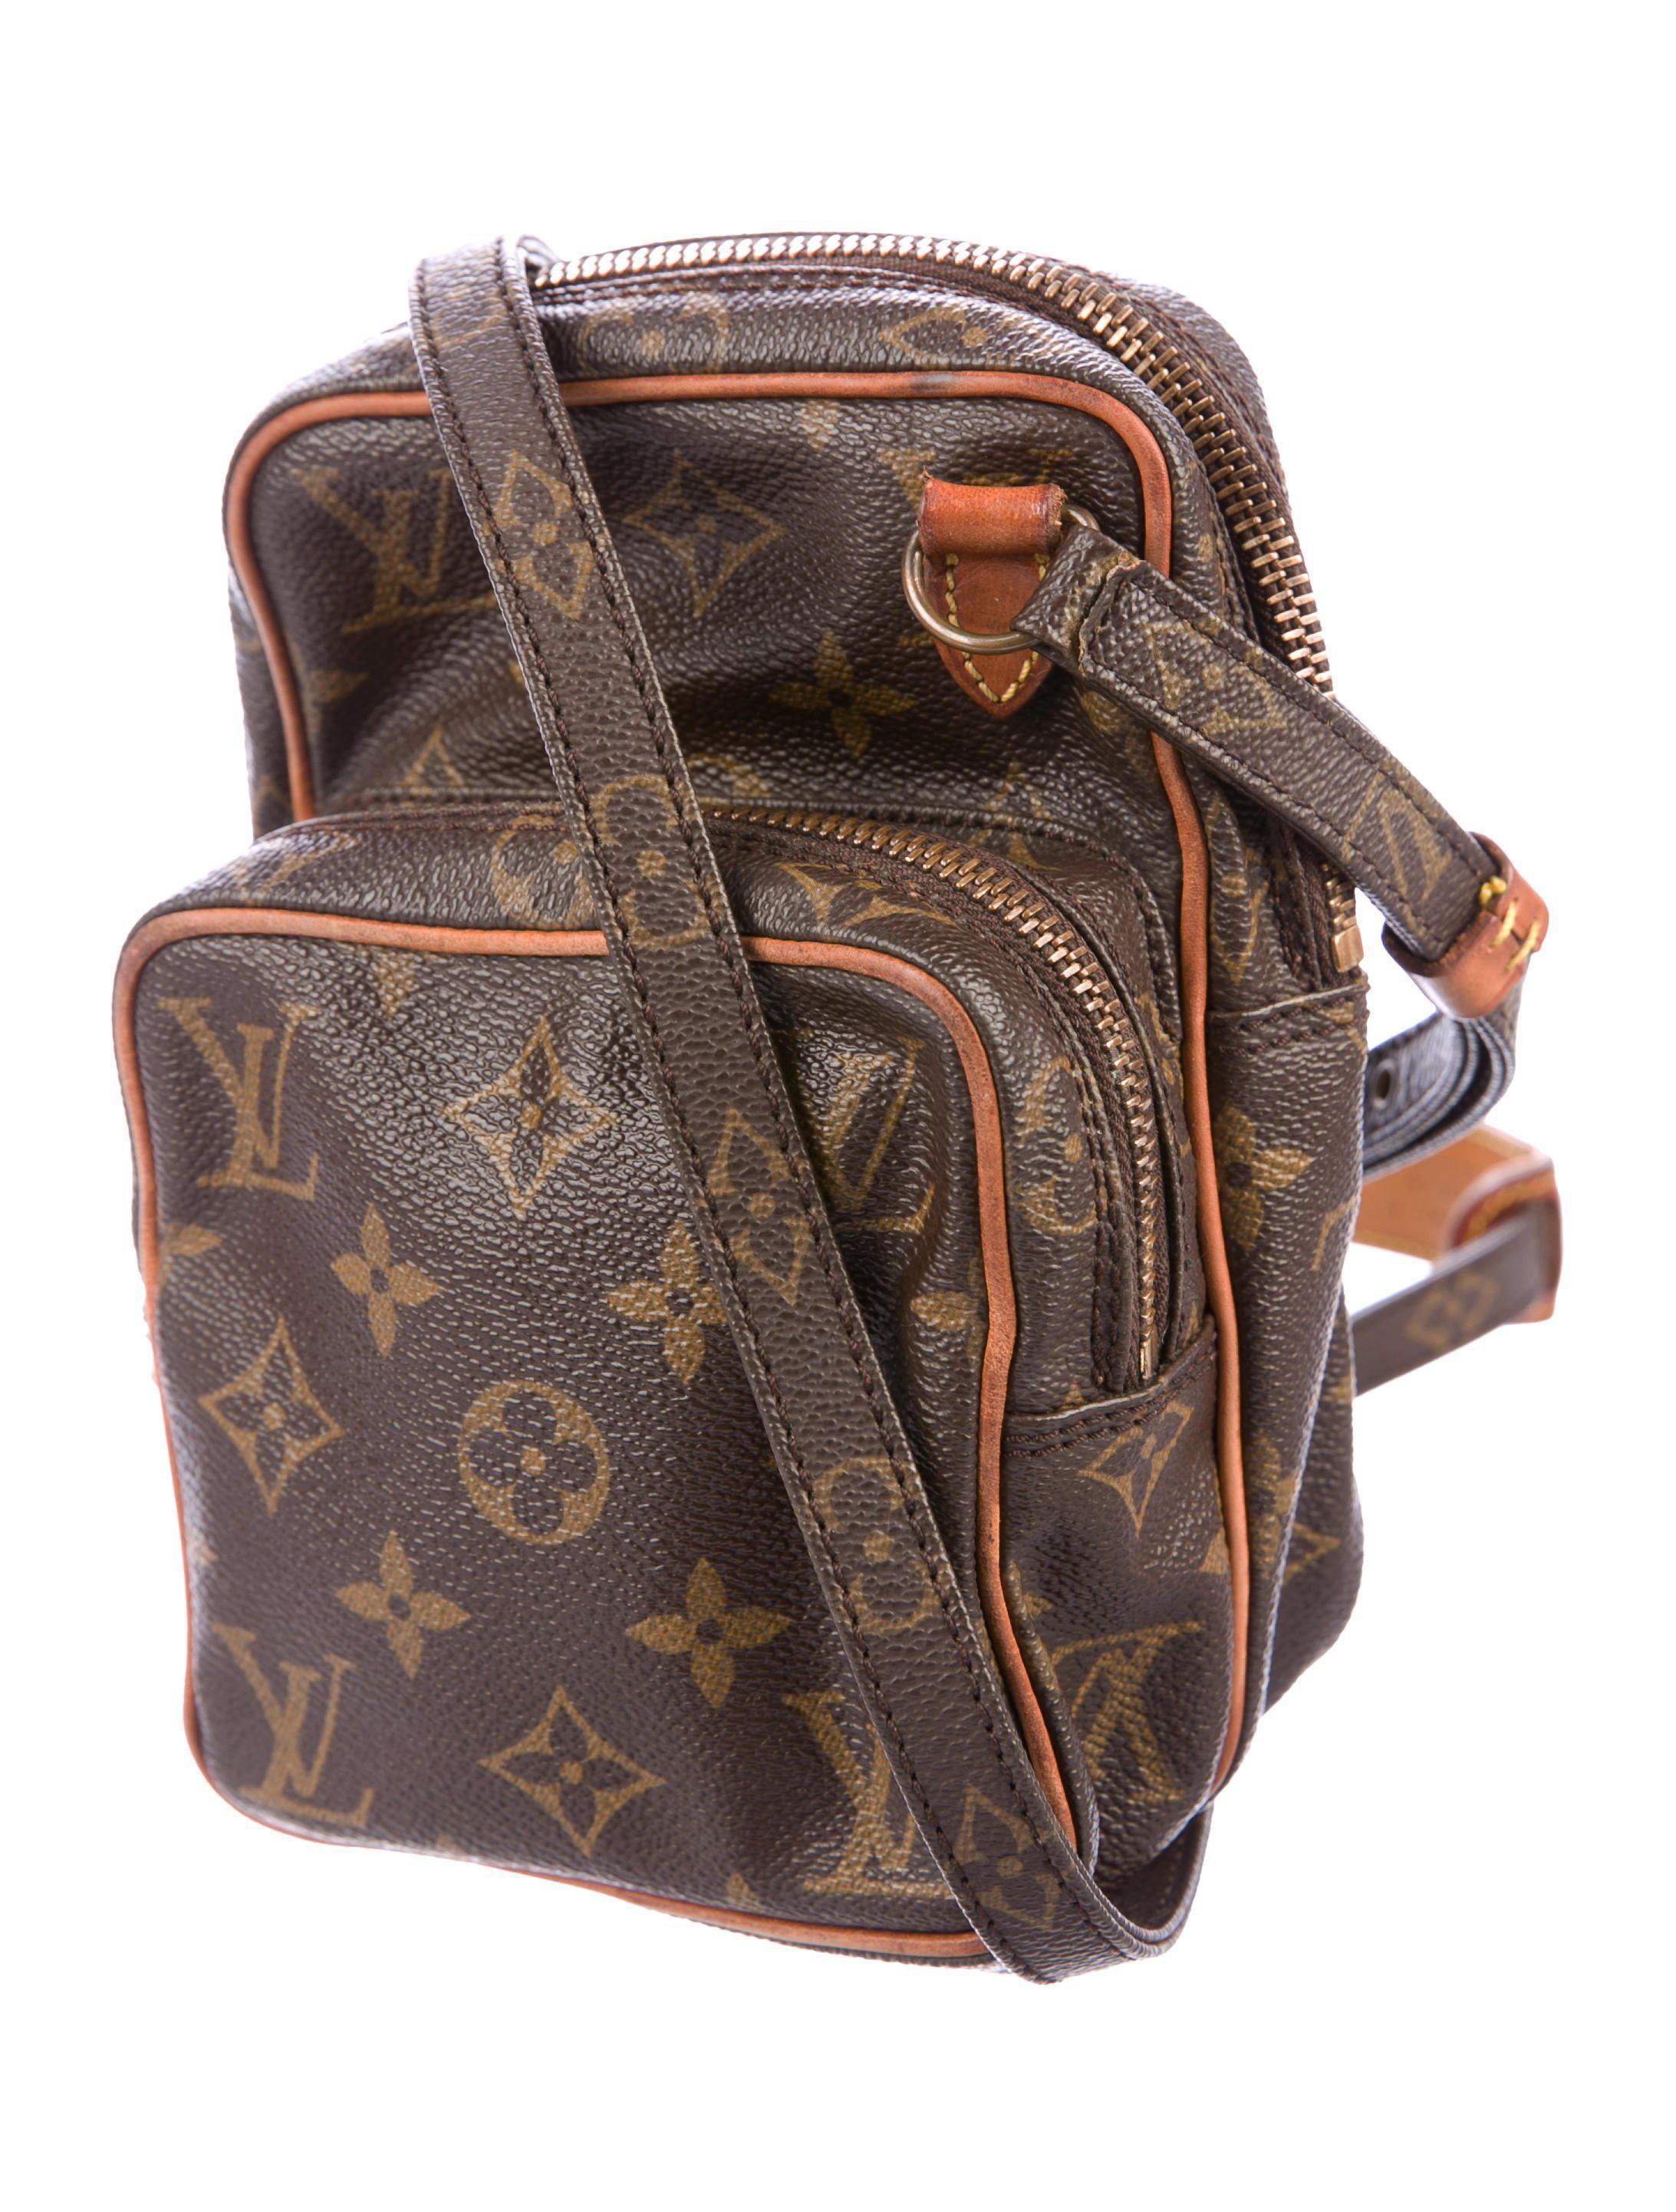 09be791b78b9 Lyst - Louis Vuitton Monogram Mini Amazone Bag Brown in Natural for Men